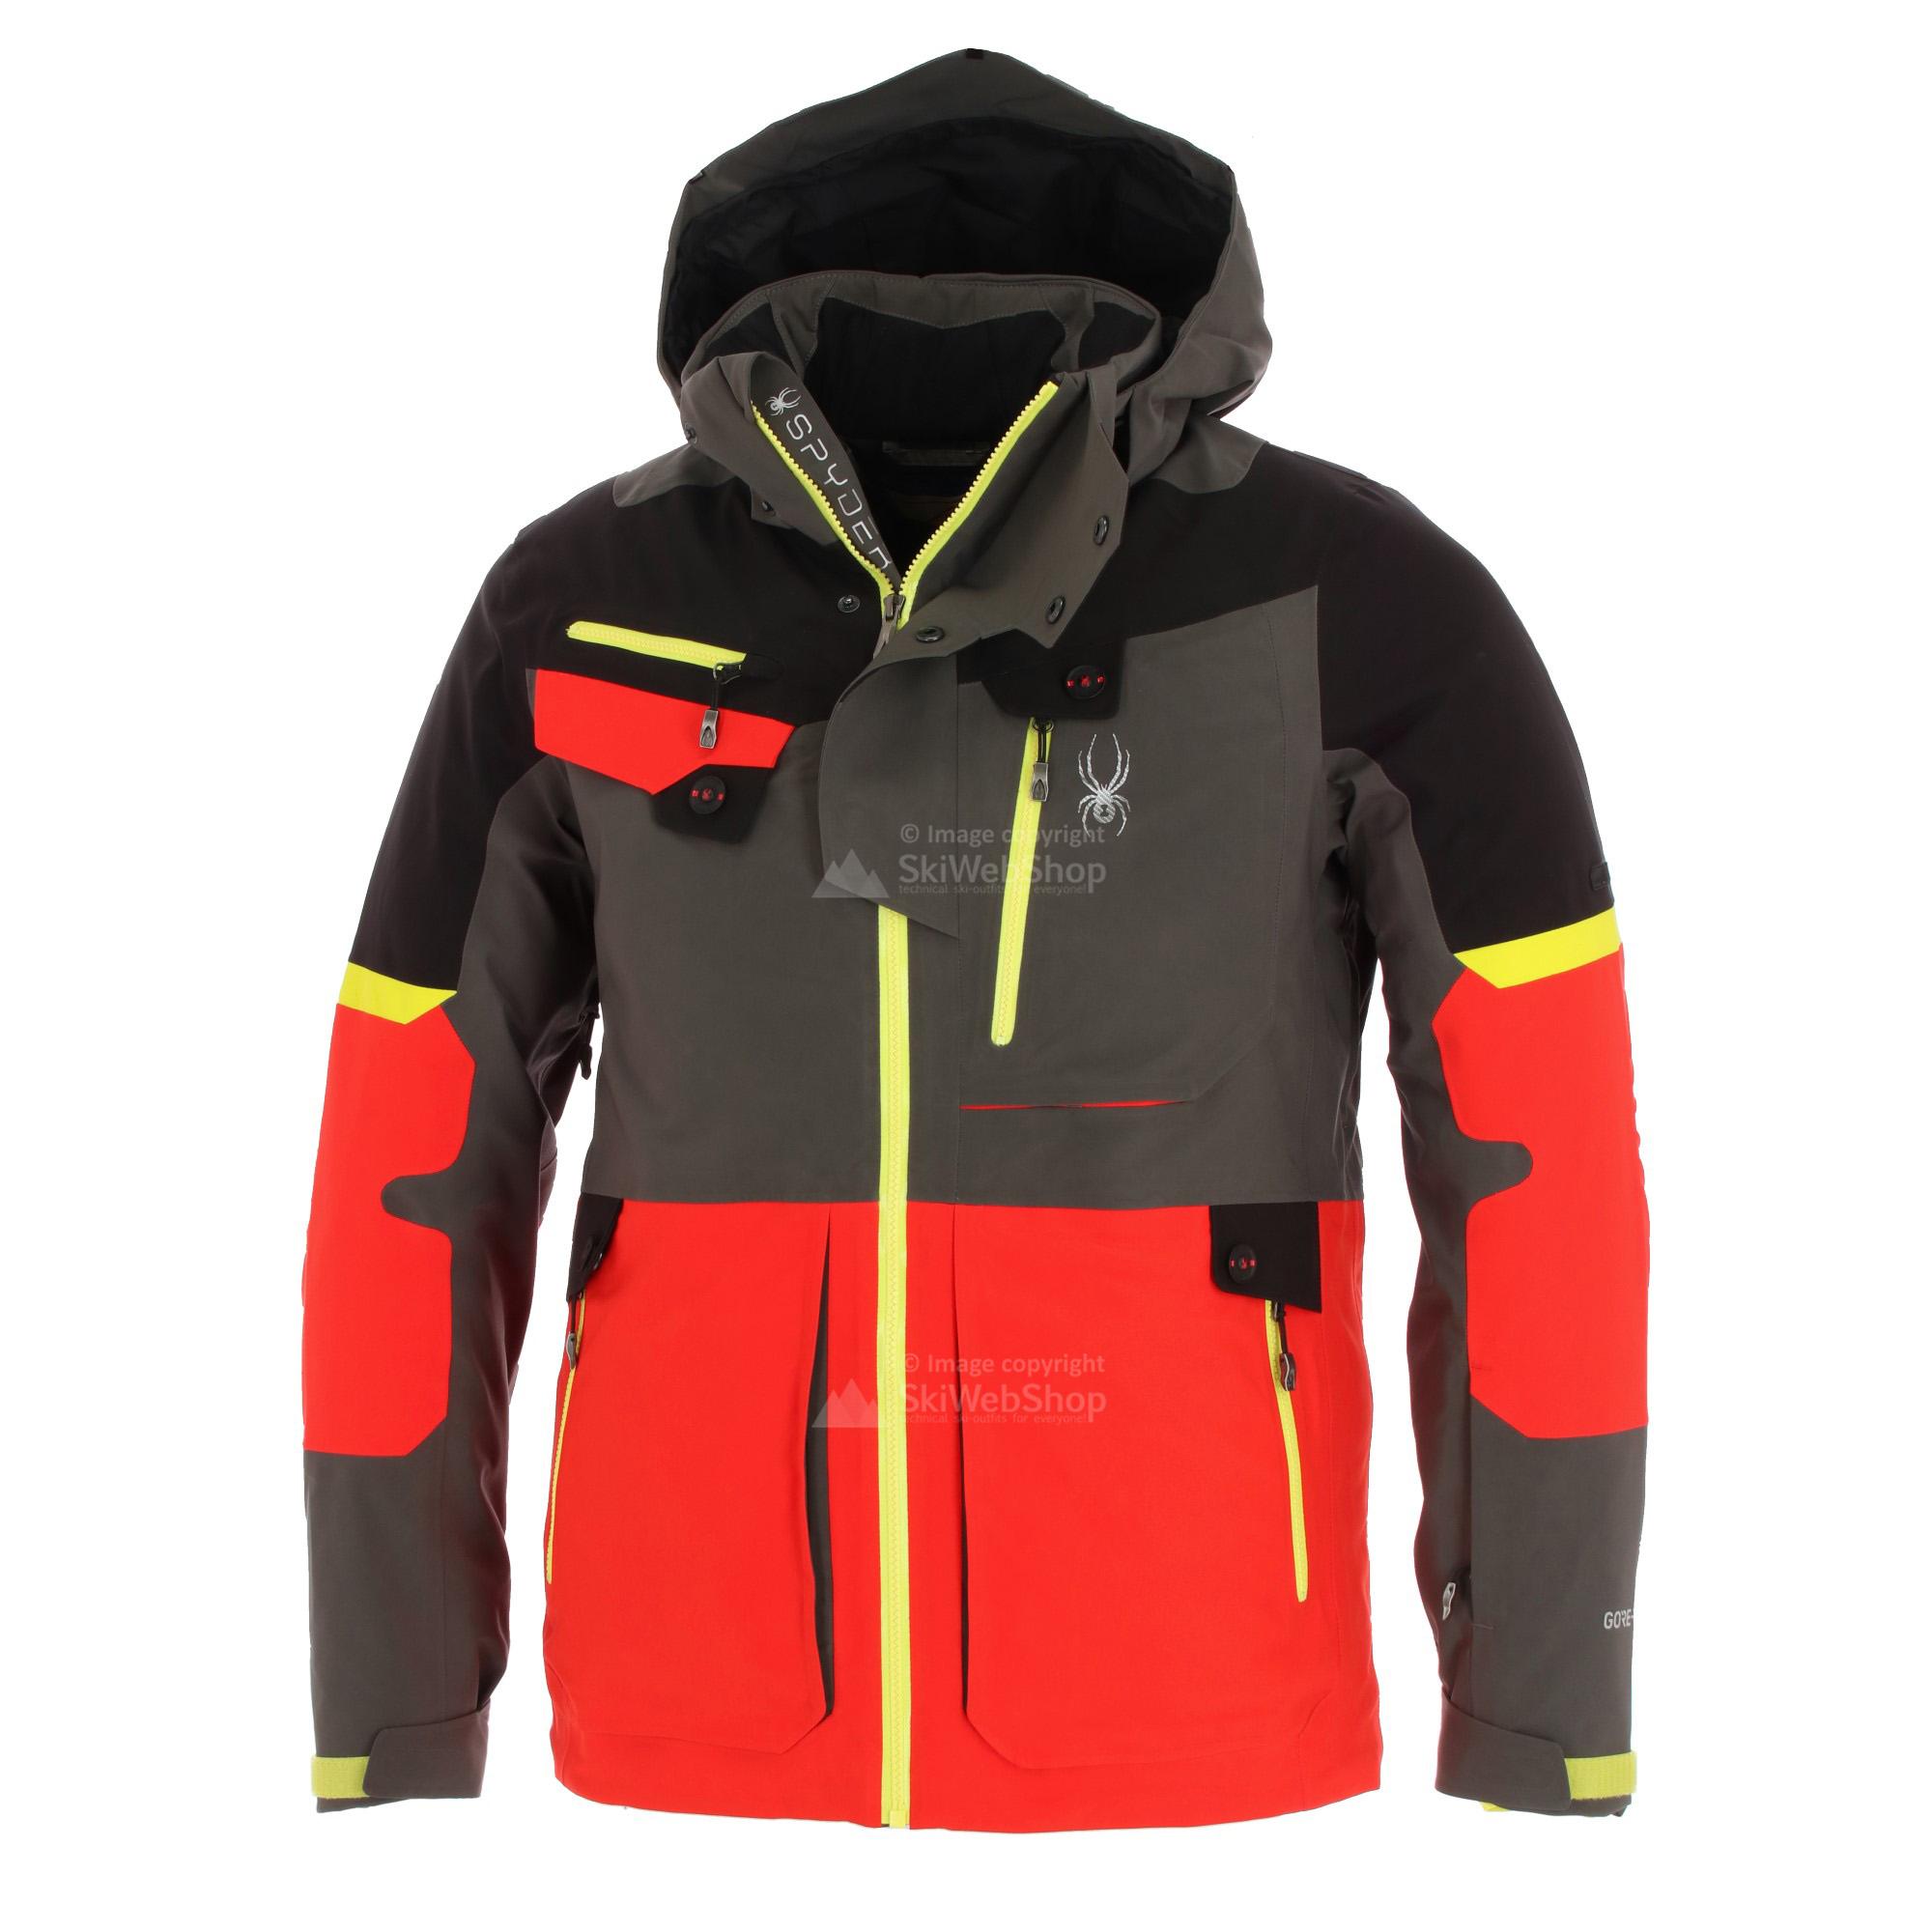 4ad9033b6e0cdc spyder-tordrillo-ski-jas-heren-polar-grijsvolcano-roodzwart-01.1518.jpg